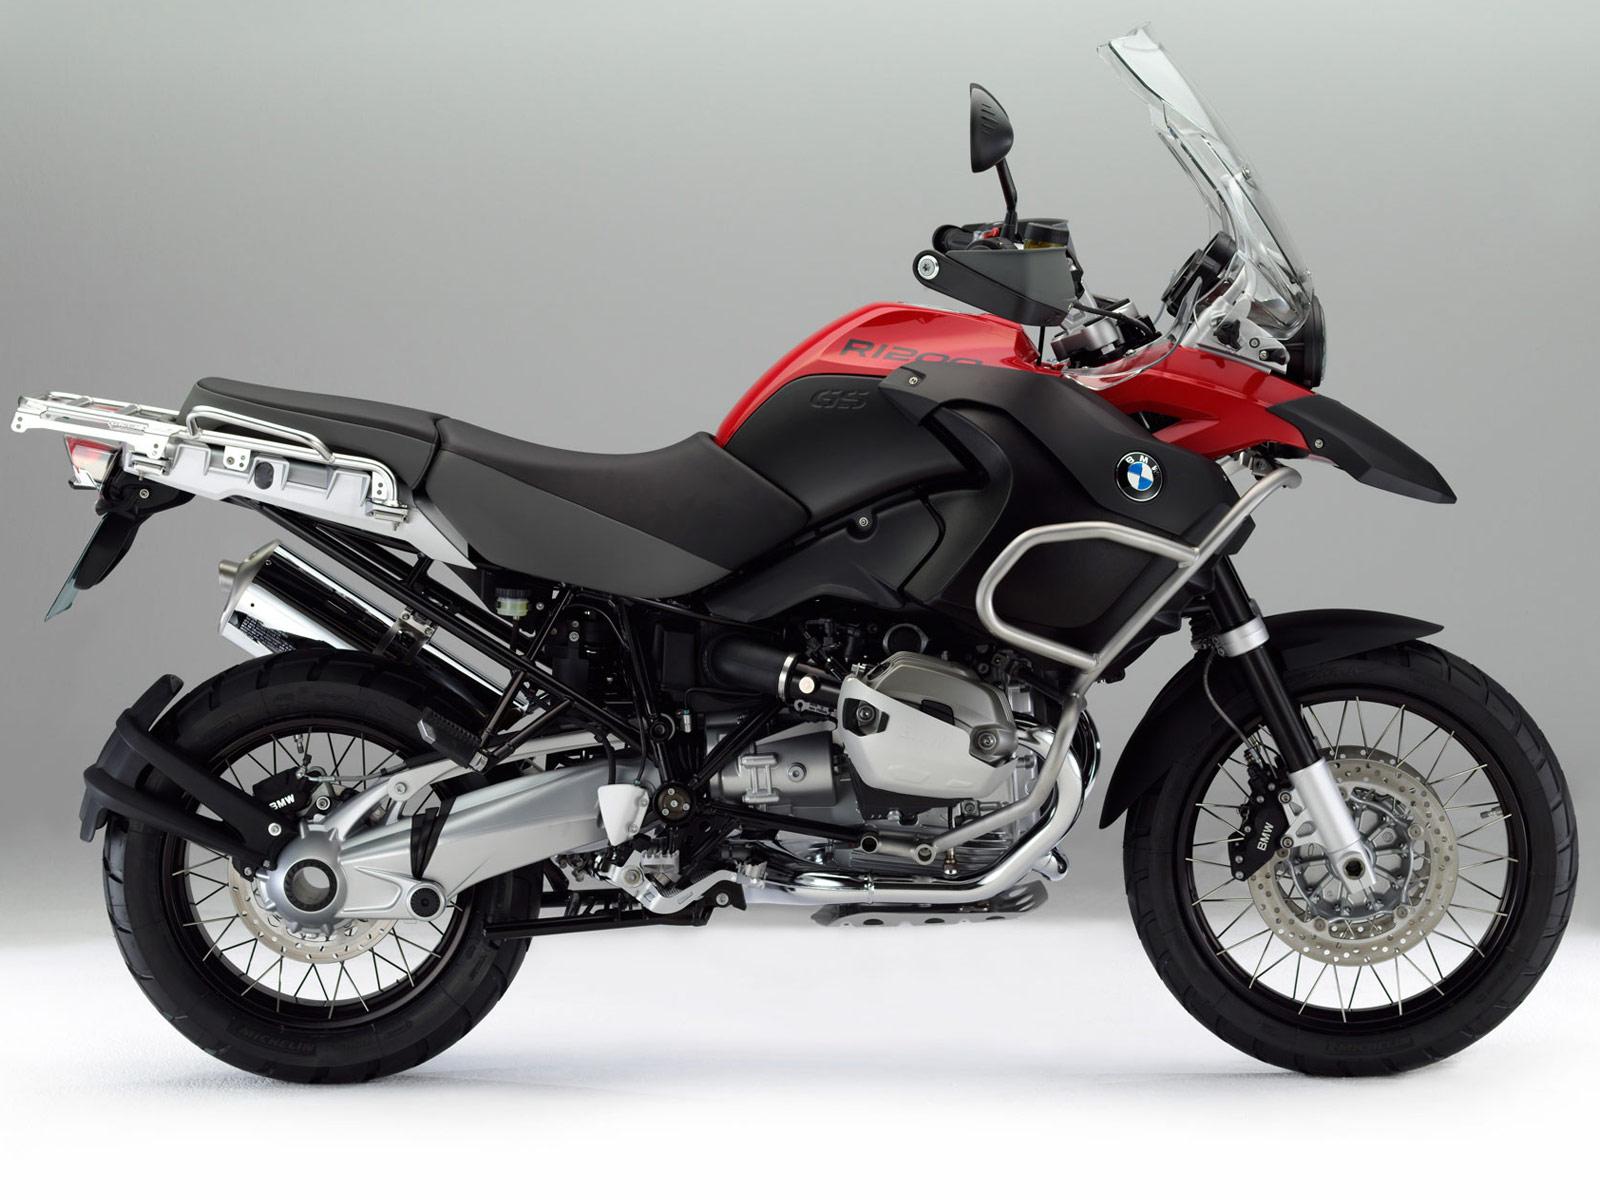 2013 Bmw R1200gs Adventure Triple Black Motorcycle Pictures Specs ...